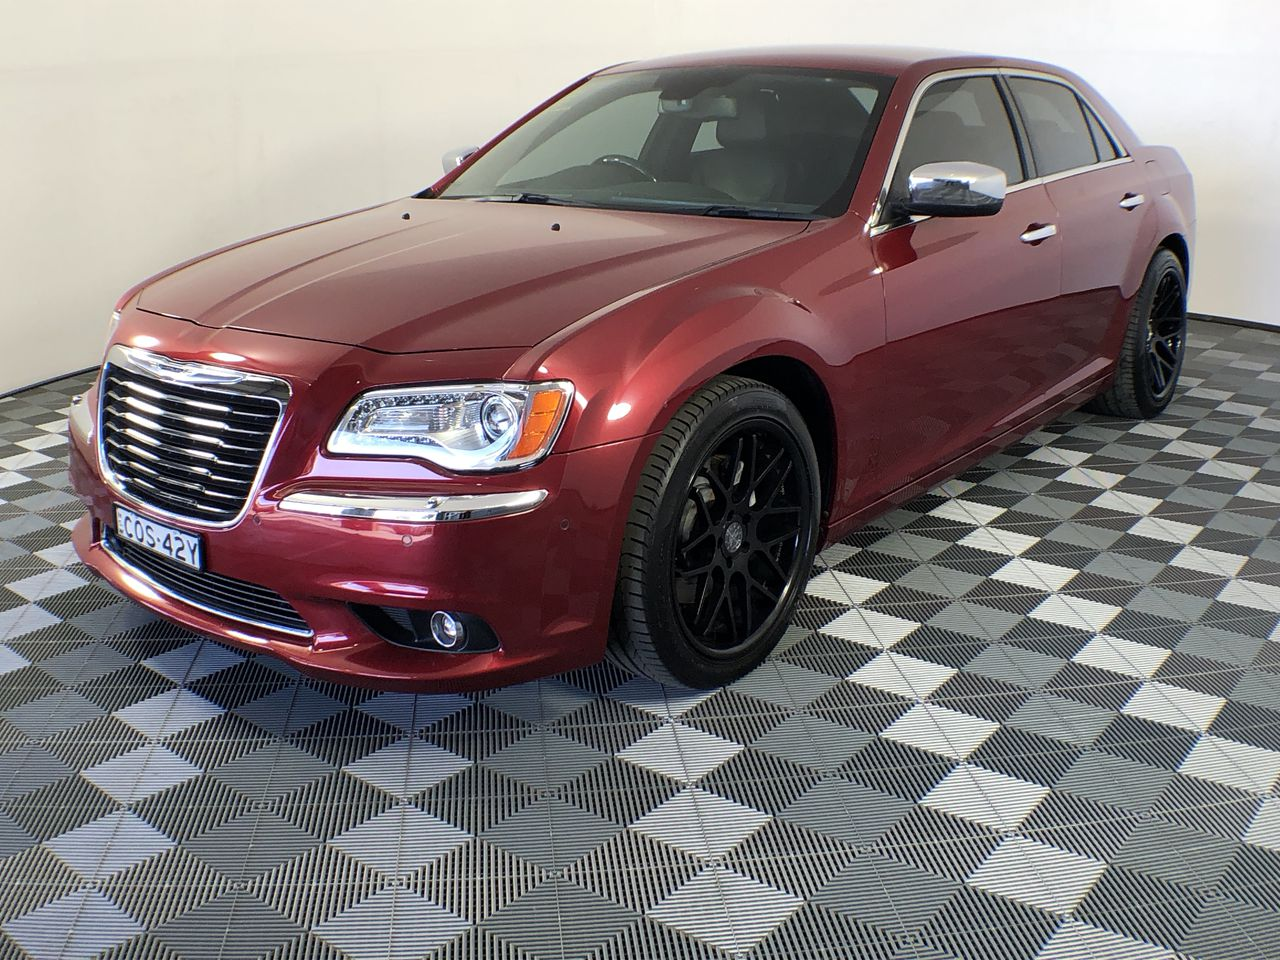 2012 Chrysler 300 C LX Automatic Sedan 49,034km